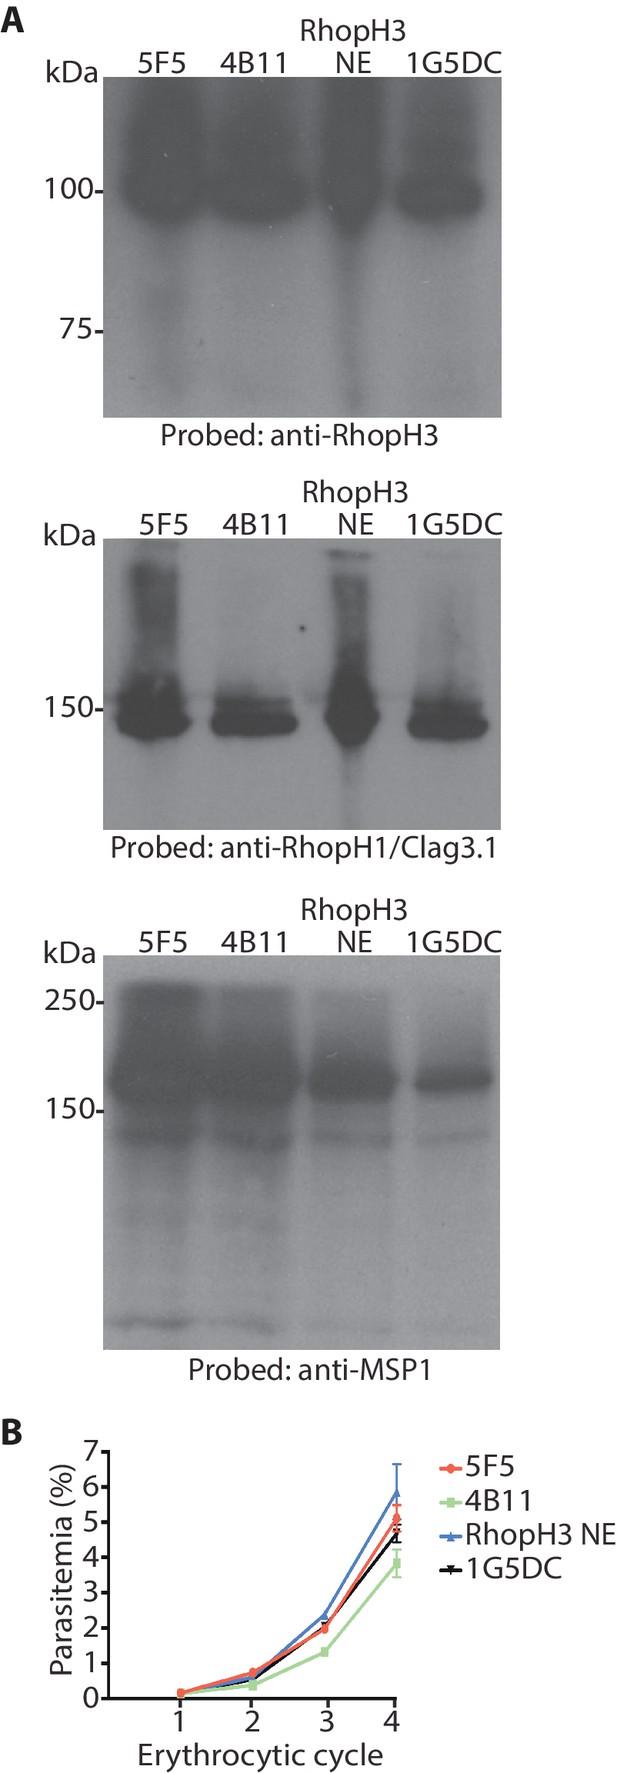 The Plasmodium falciparum rhoptry protein RhopH3 plays essential